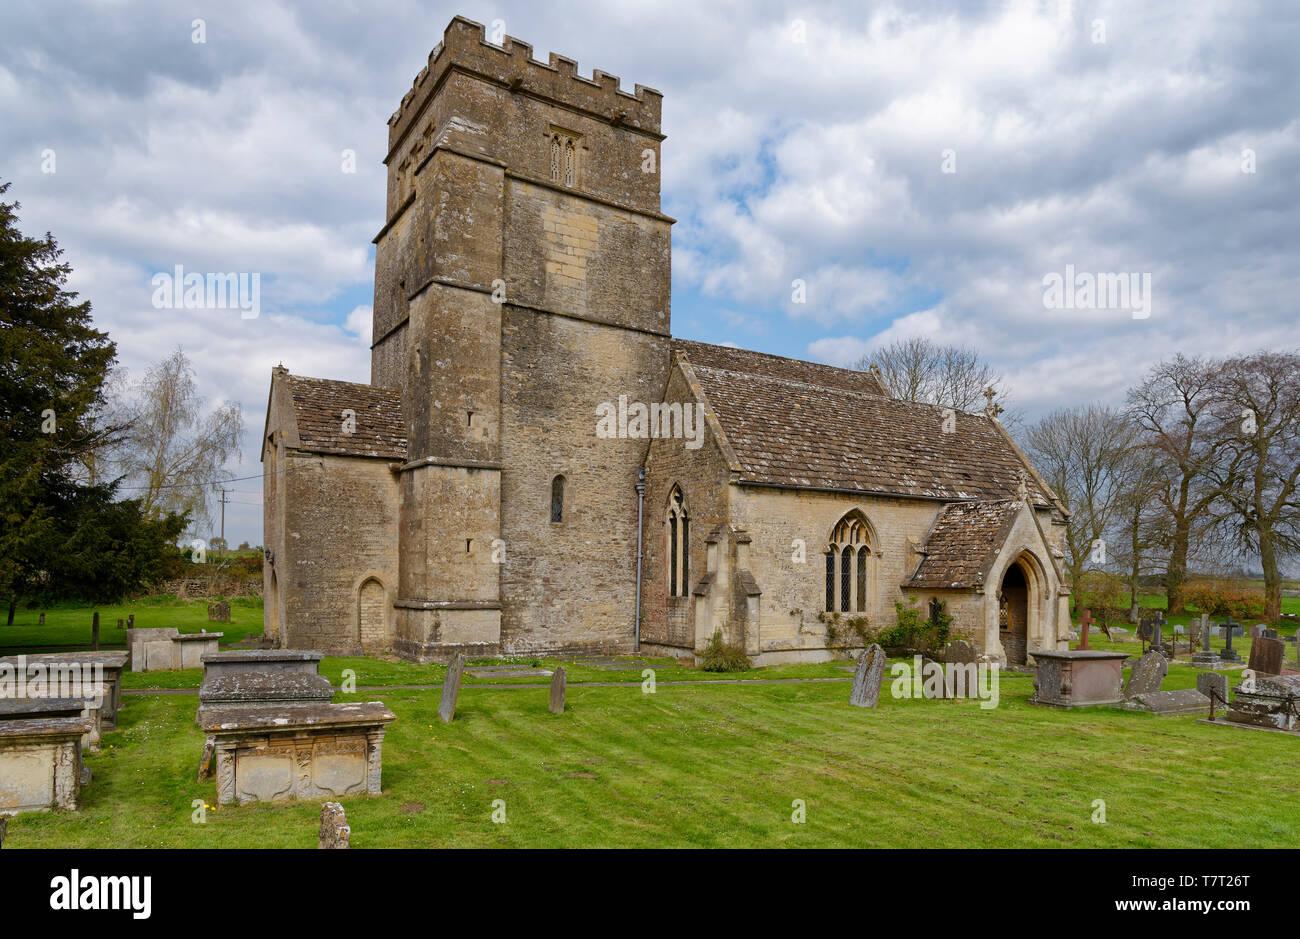 St Mary Magdelene Church, Tormarton, South Gloucestershire, UK  Grade I listed Norman Church Stock Photo